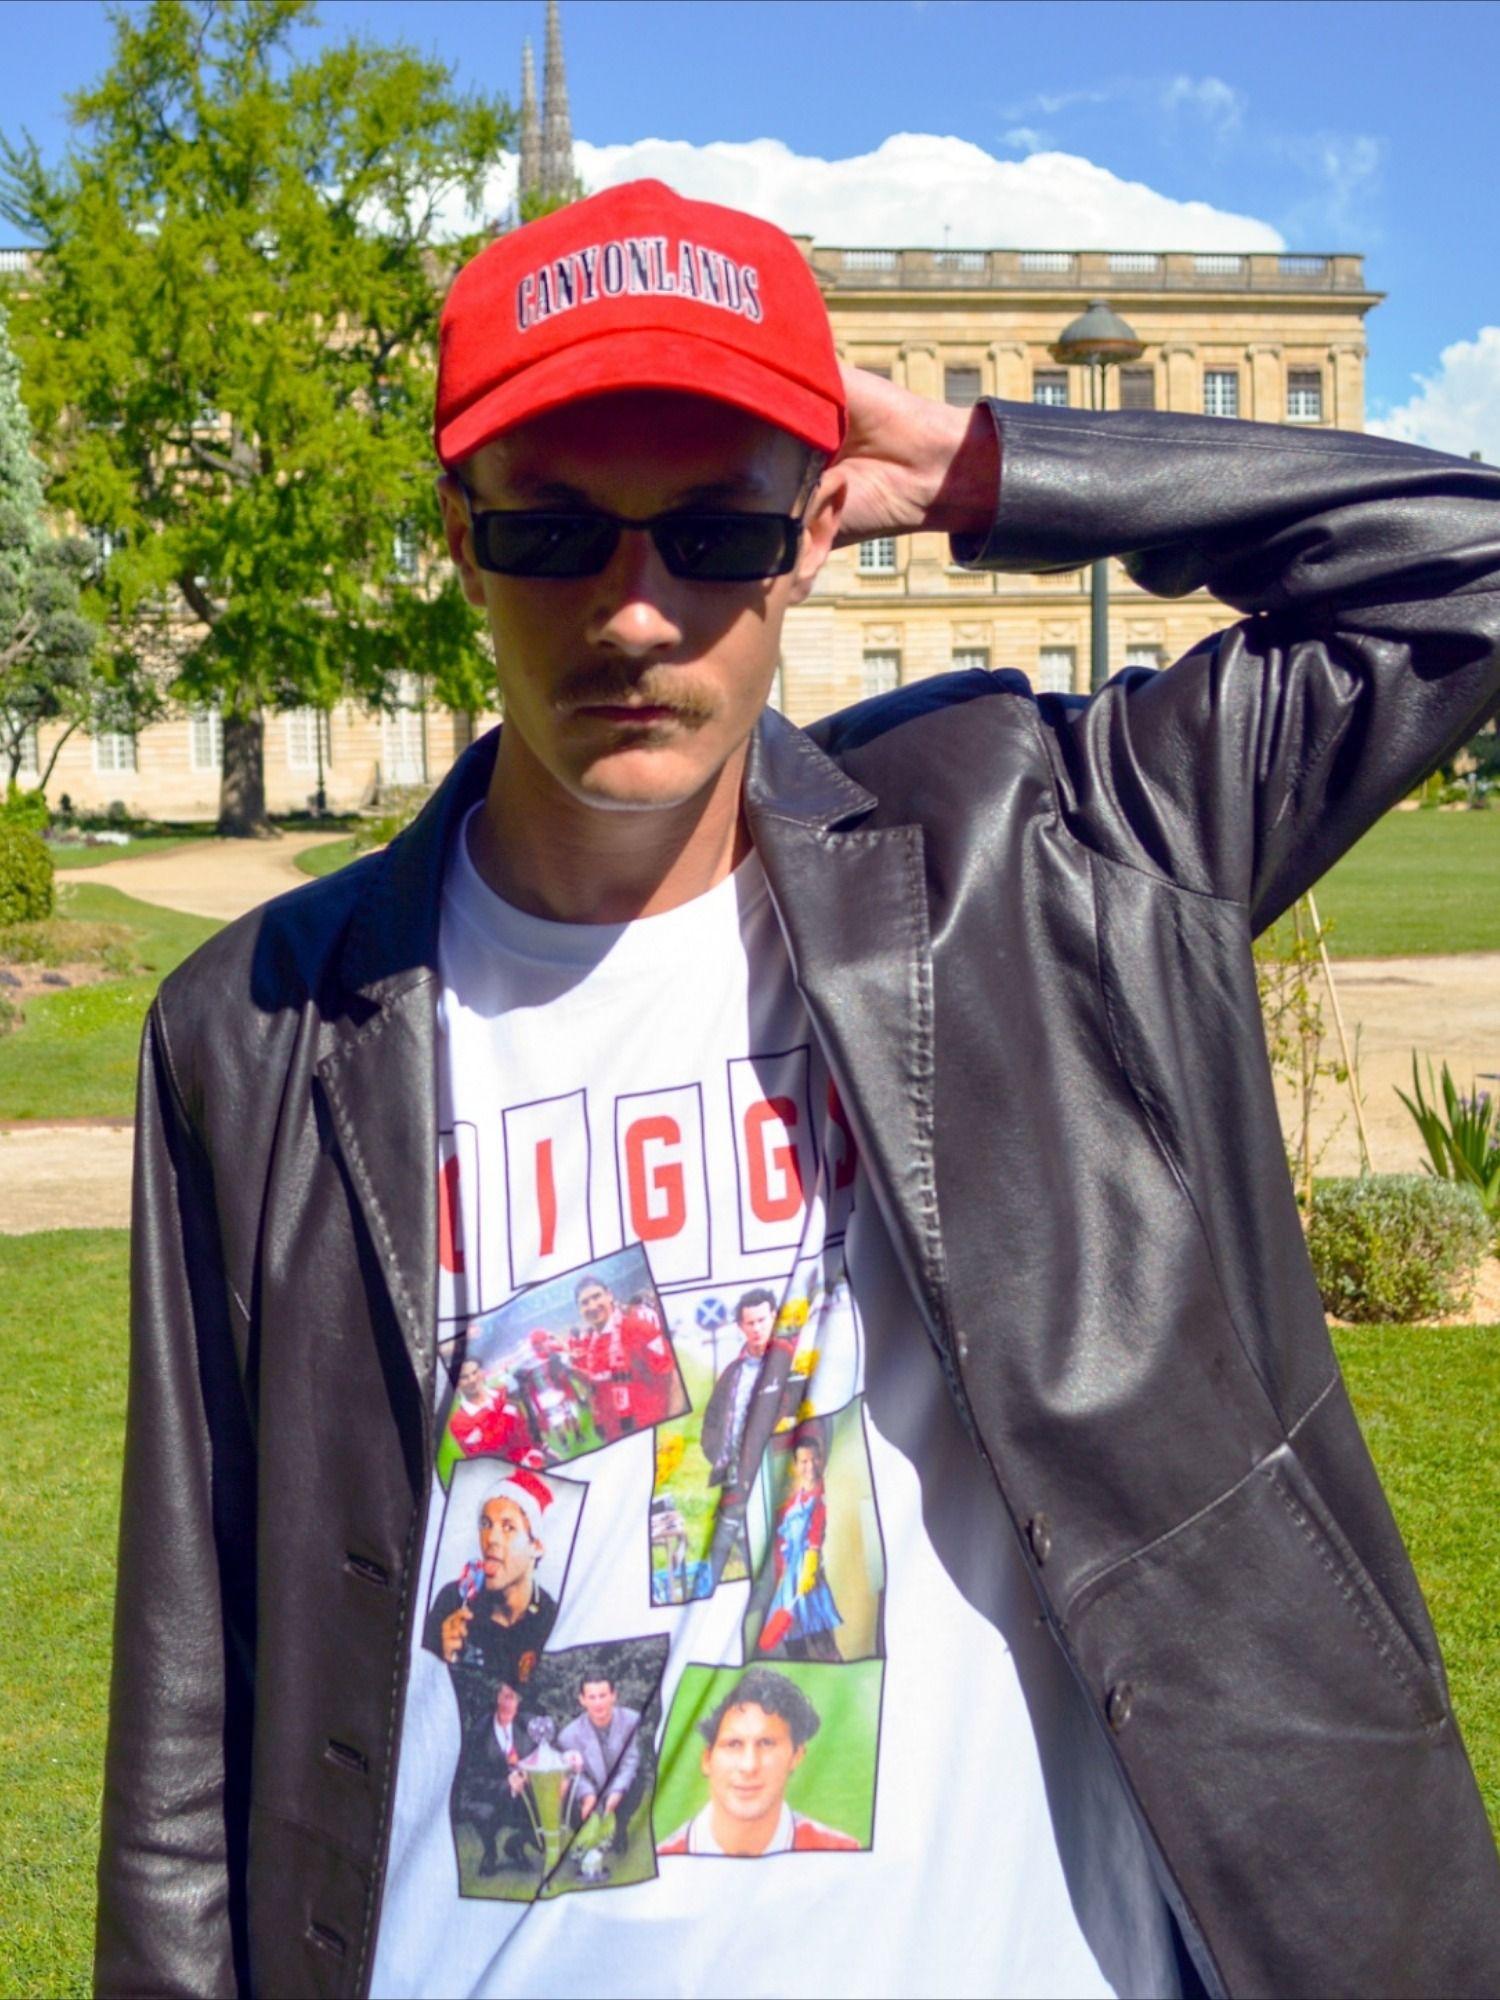 Ryan Giggs - RFG Tee #mufc #manchesterunited #giggs #soccer